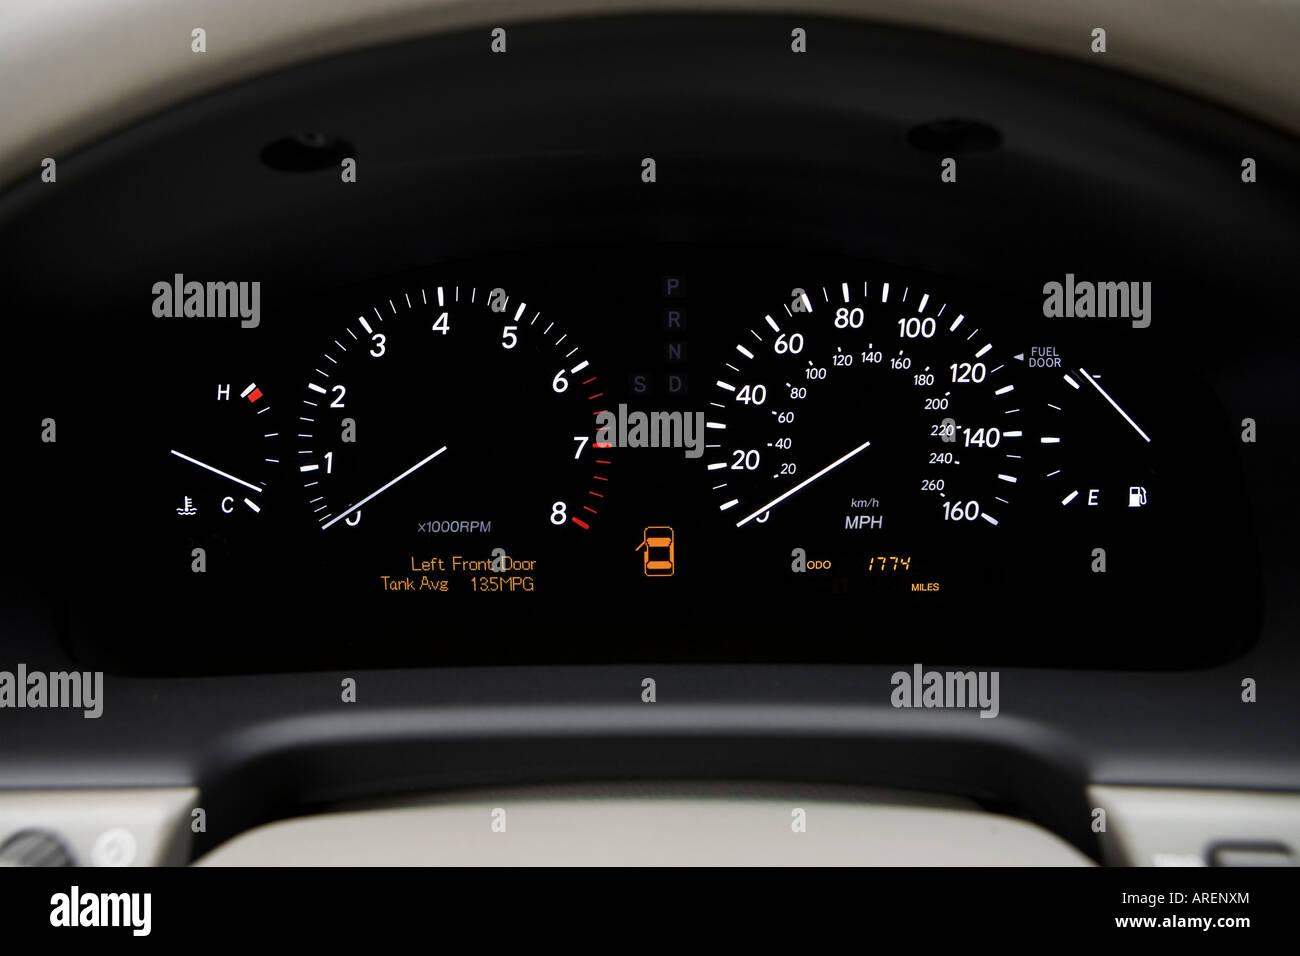 Lexus Ls 430 Stock Photos & Lexus Ls 430 Stock Images - Alamy